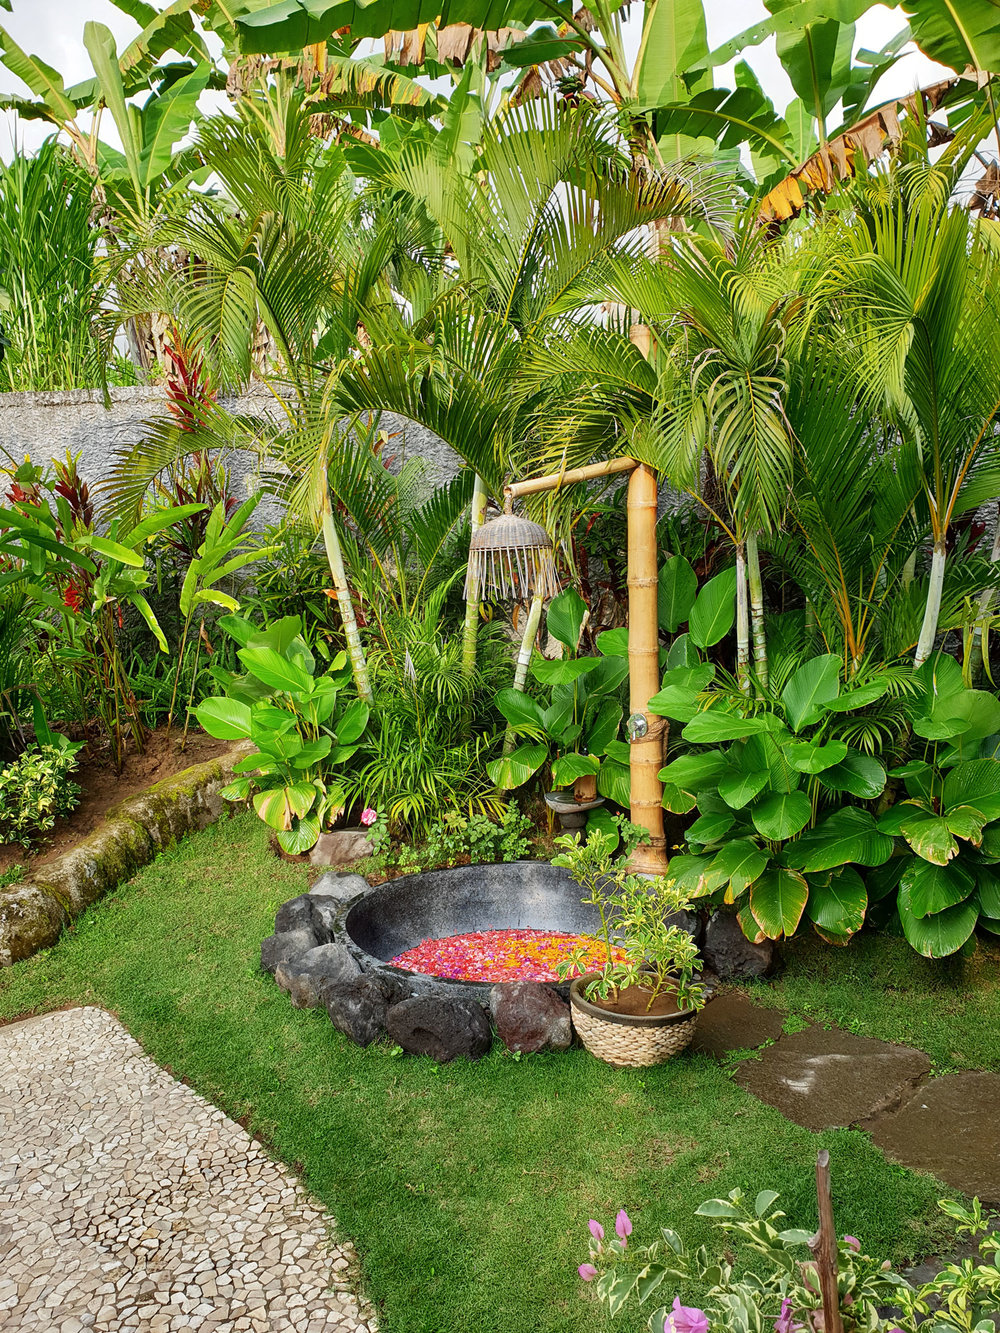 villanirvana_outdoorbath.jpg